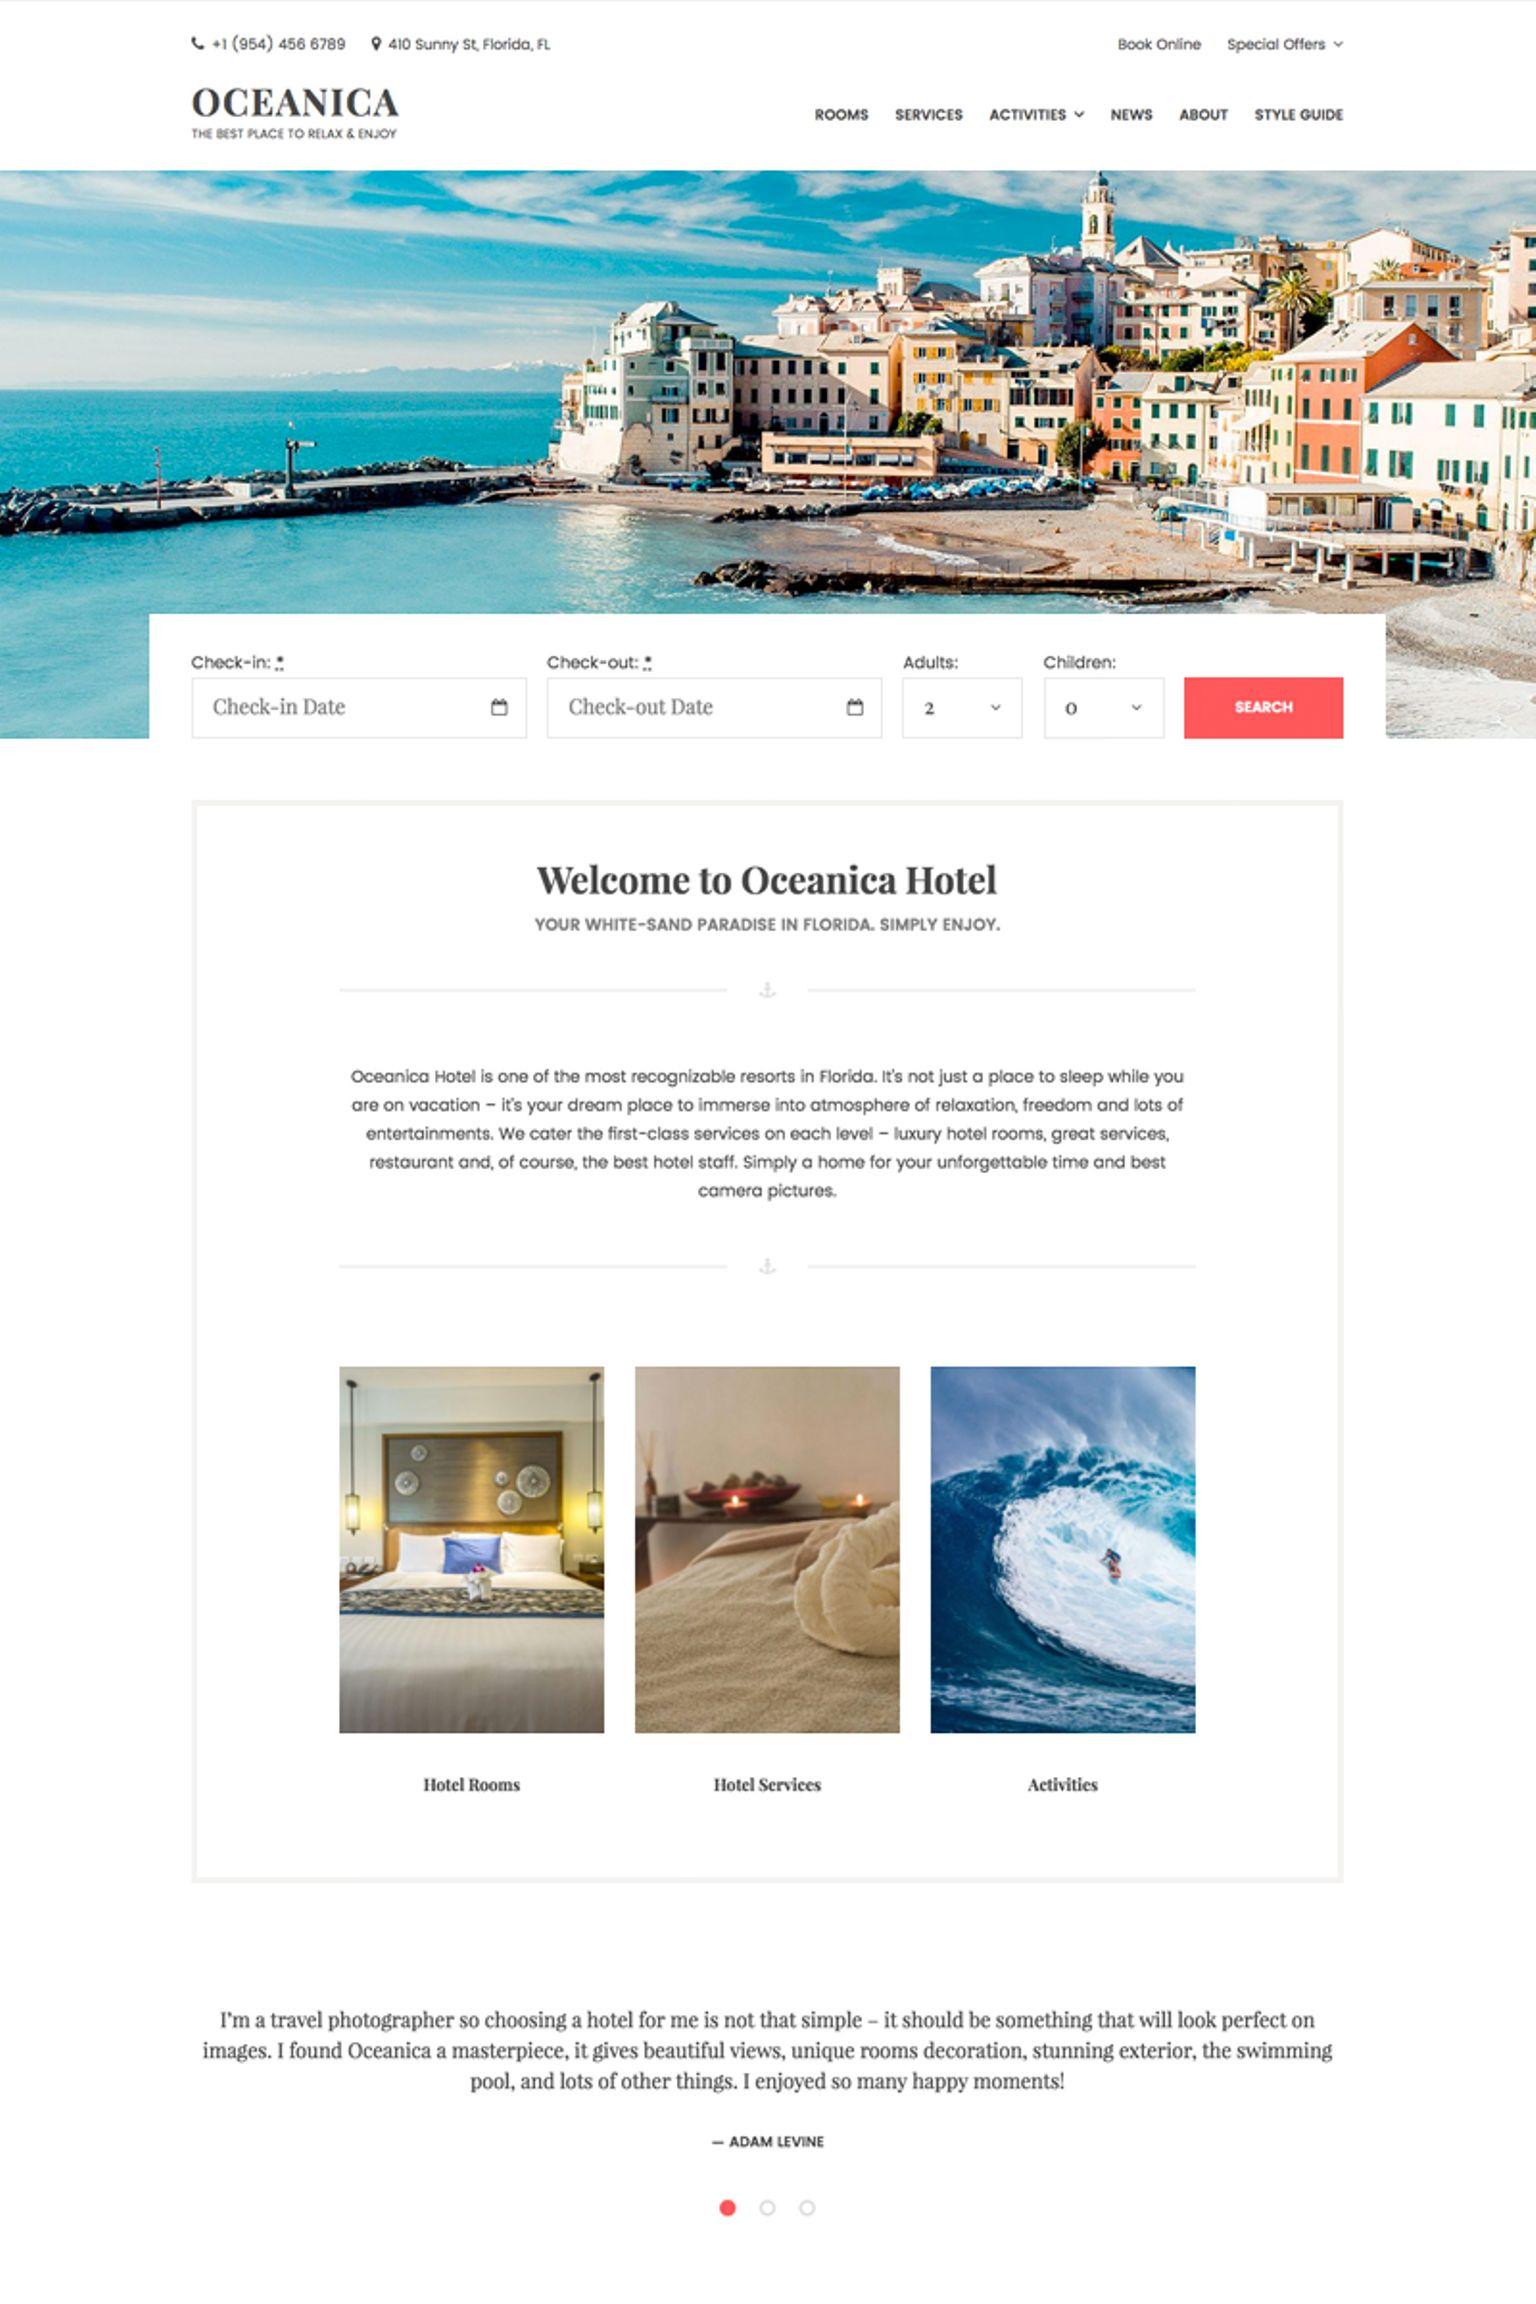 oceanica hotel booking wordpress theme 64367. Black Bedroom Furniture Sets. Home Design Ideas